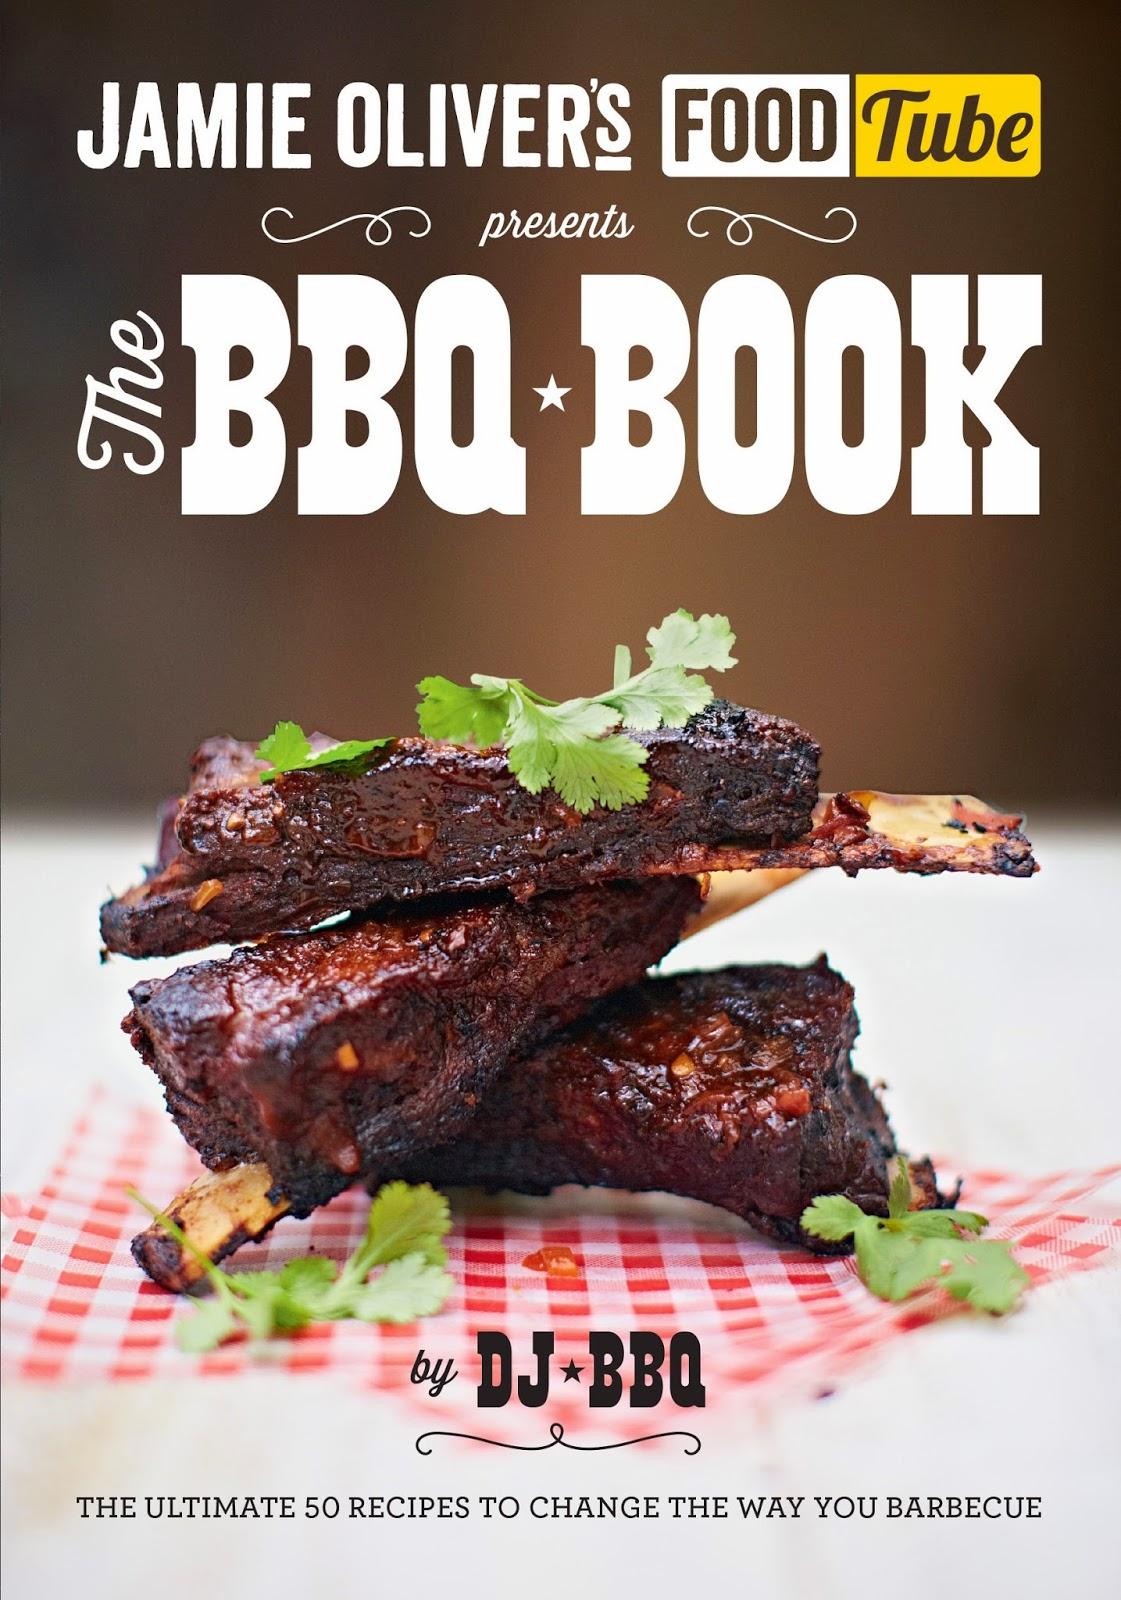 Jamie Oliver's Food Tube The Bbq Book Beattie's Cookbook And Food & Wine  Blog: Jamie